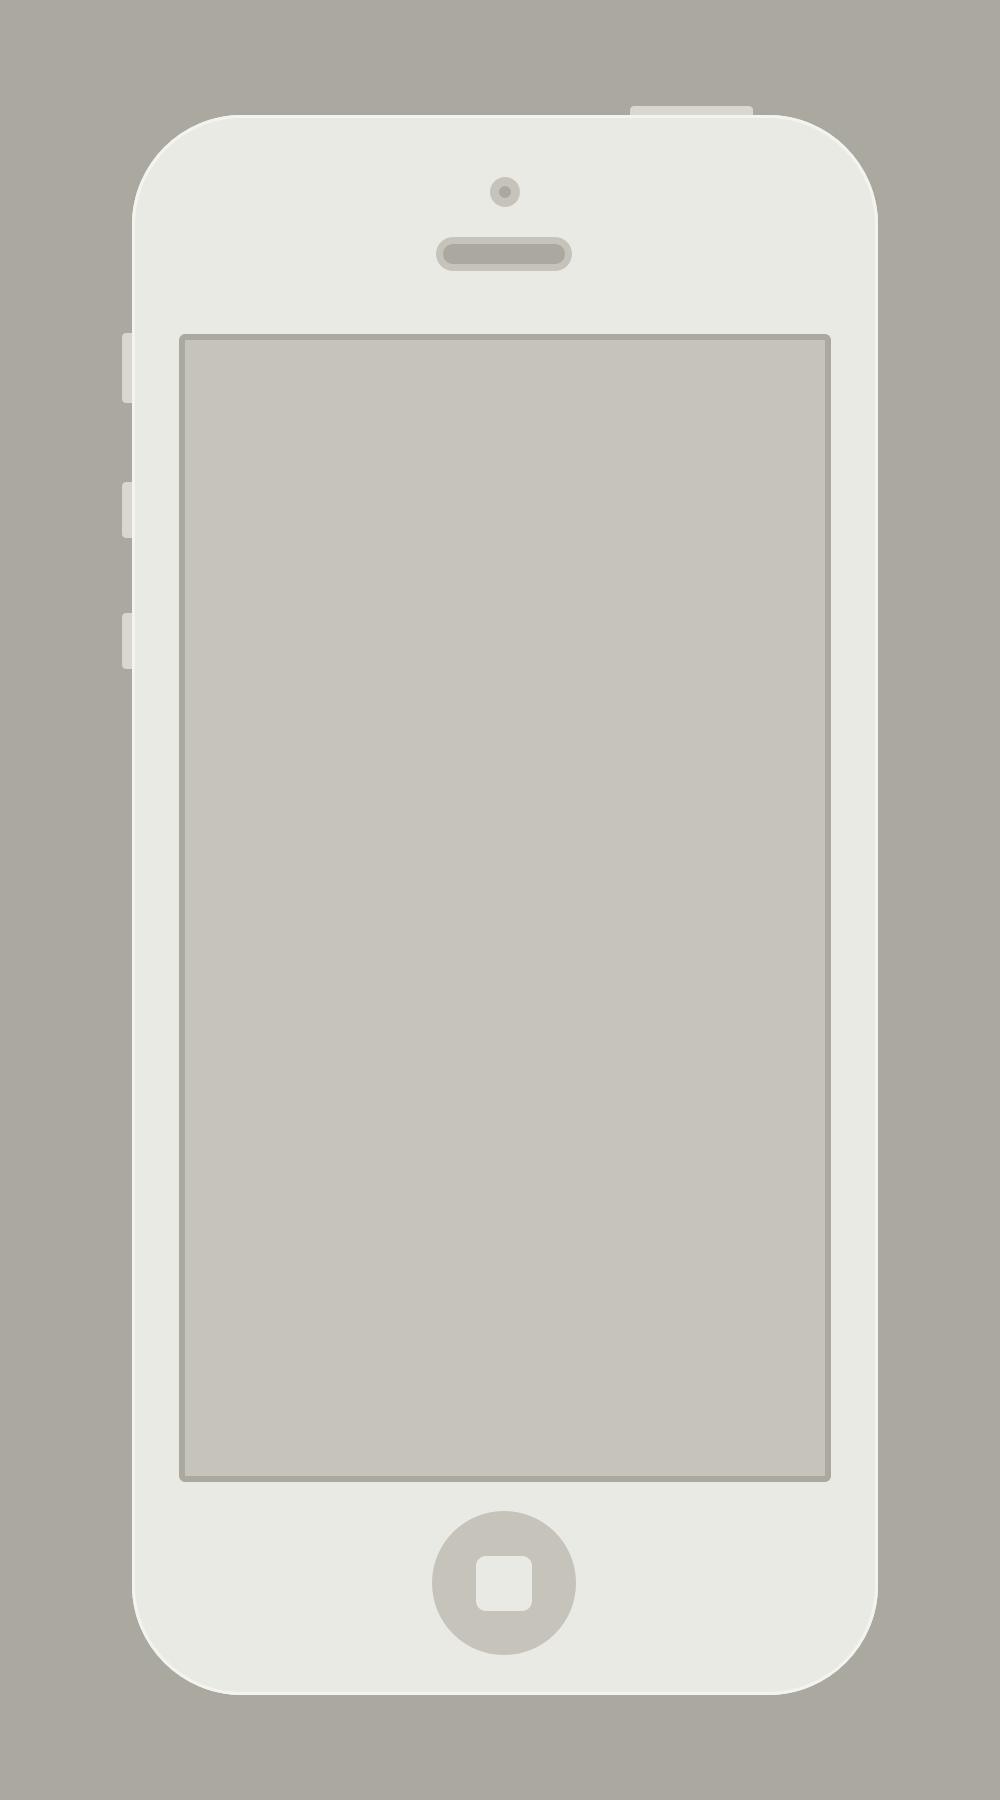 how to make iphone minimal